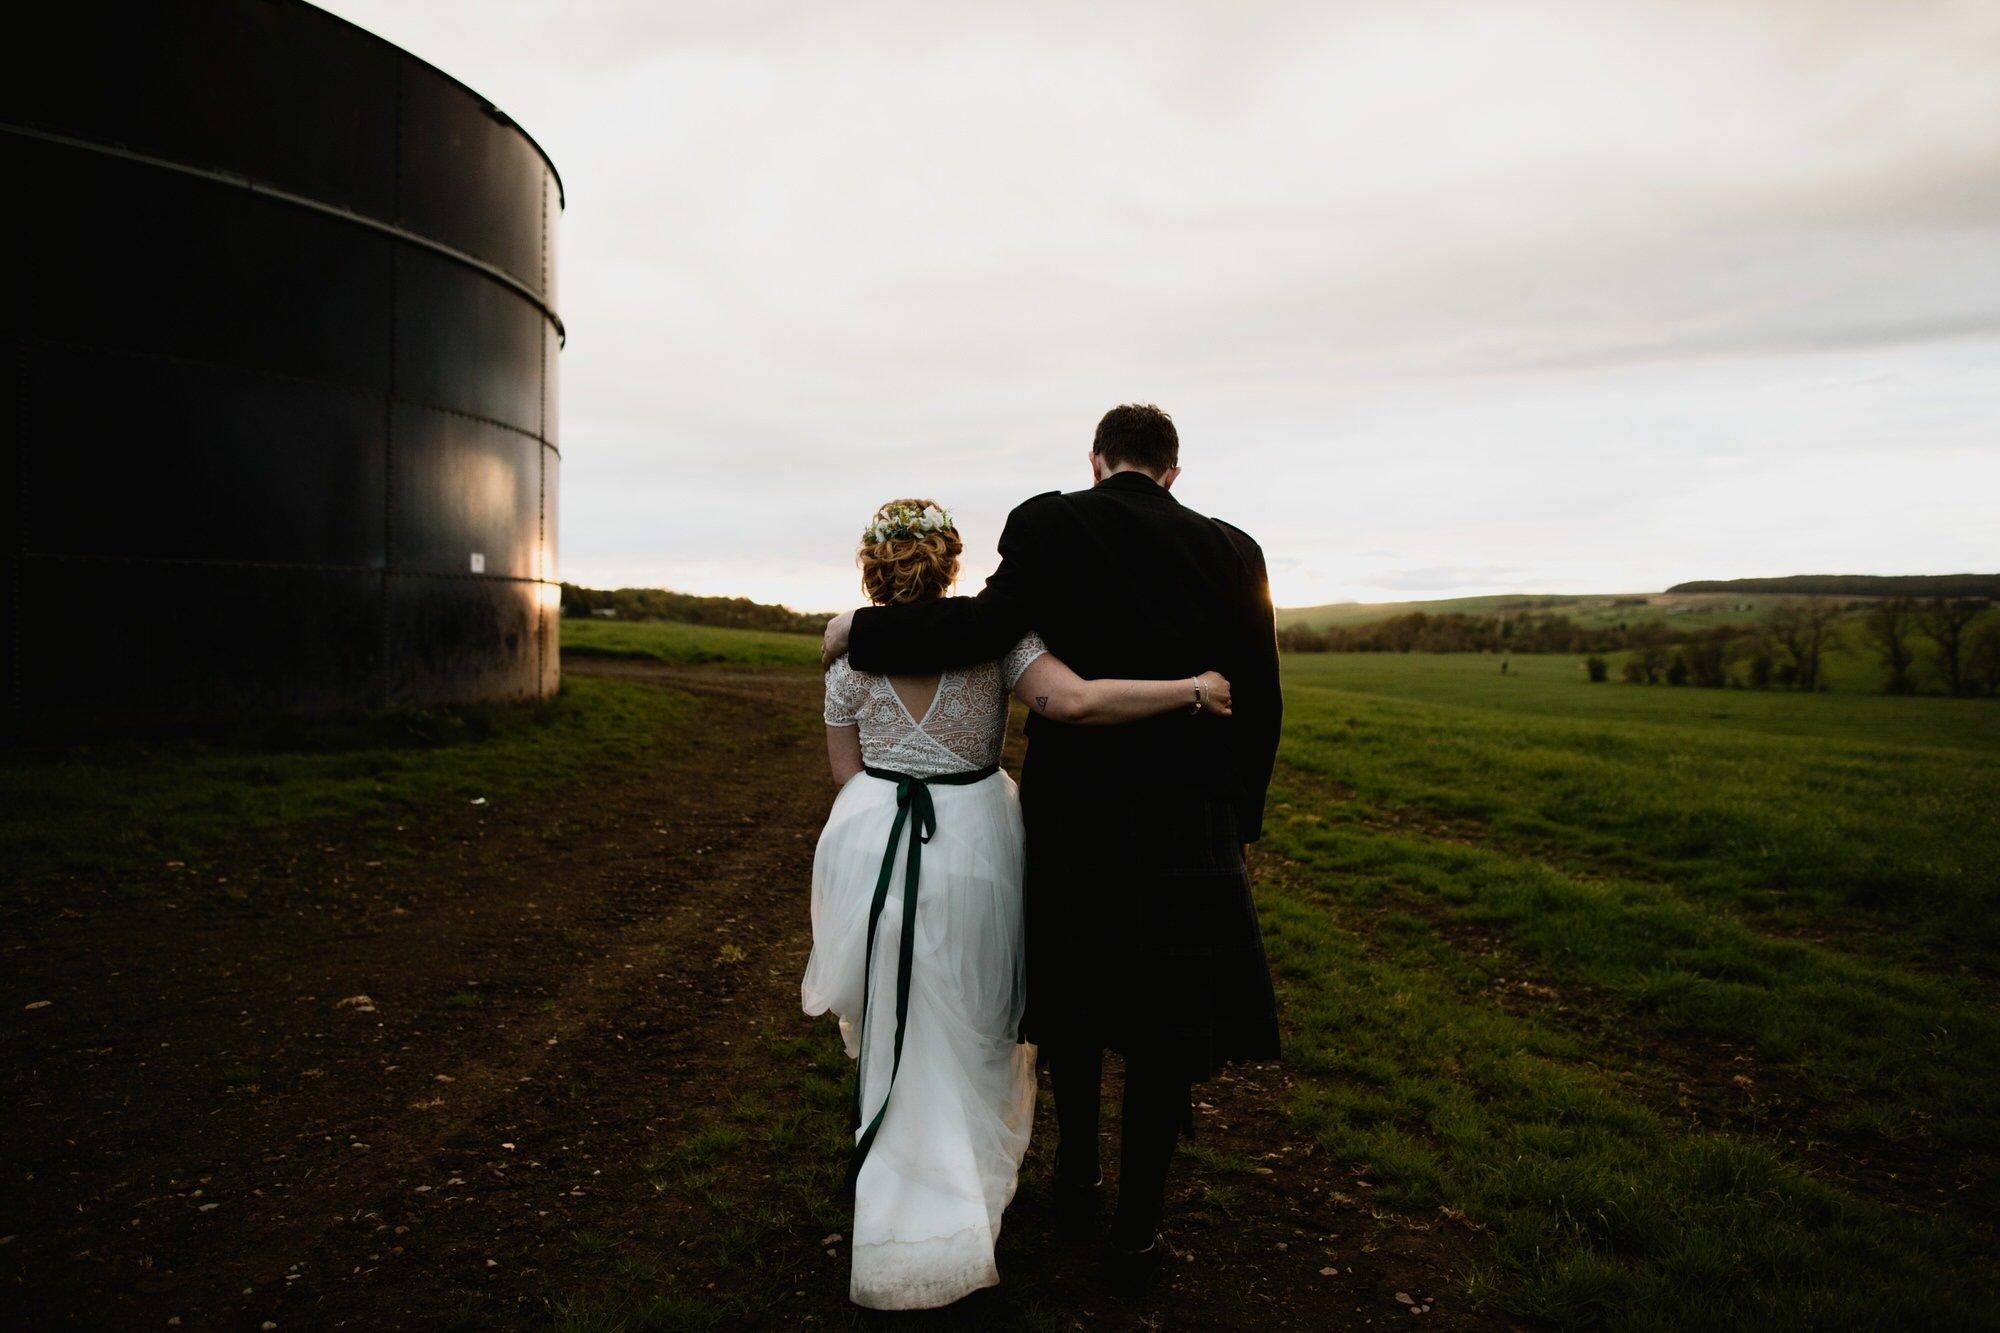 067 TIN SHED KNOCKRAICH WEDDING AUSTRIAN SCOTTISH ZOE ALEXANDRA PHOTOGRAPHY